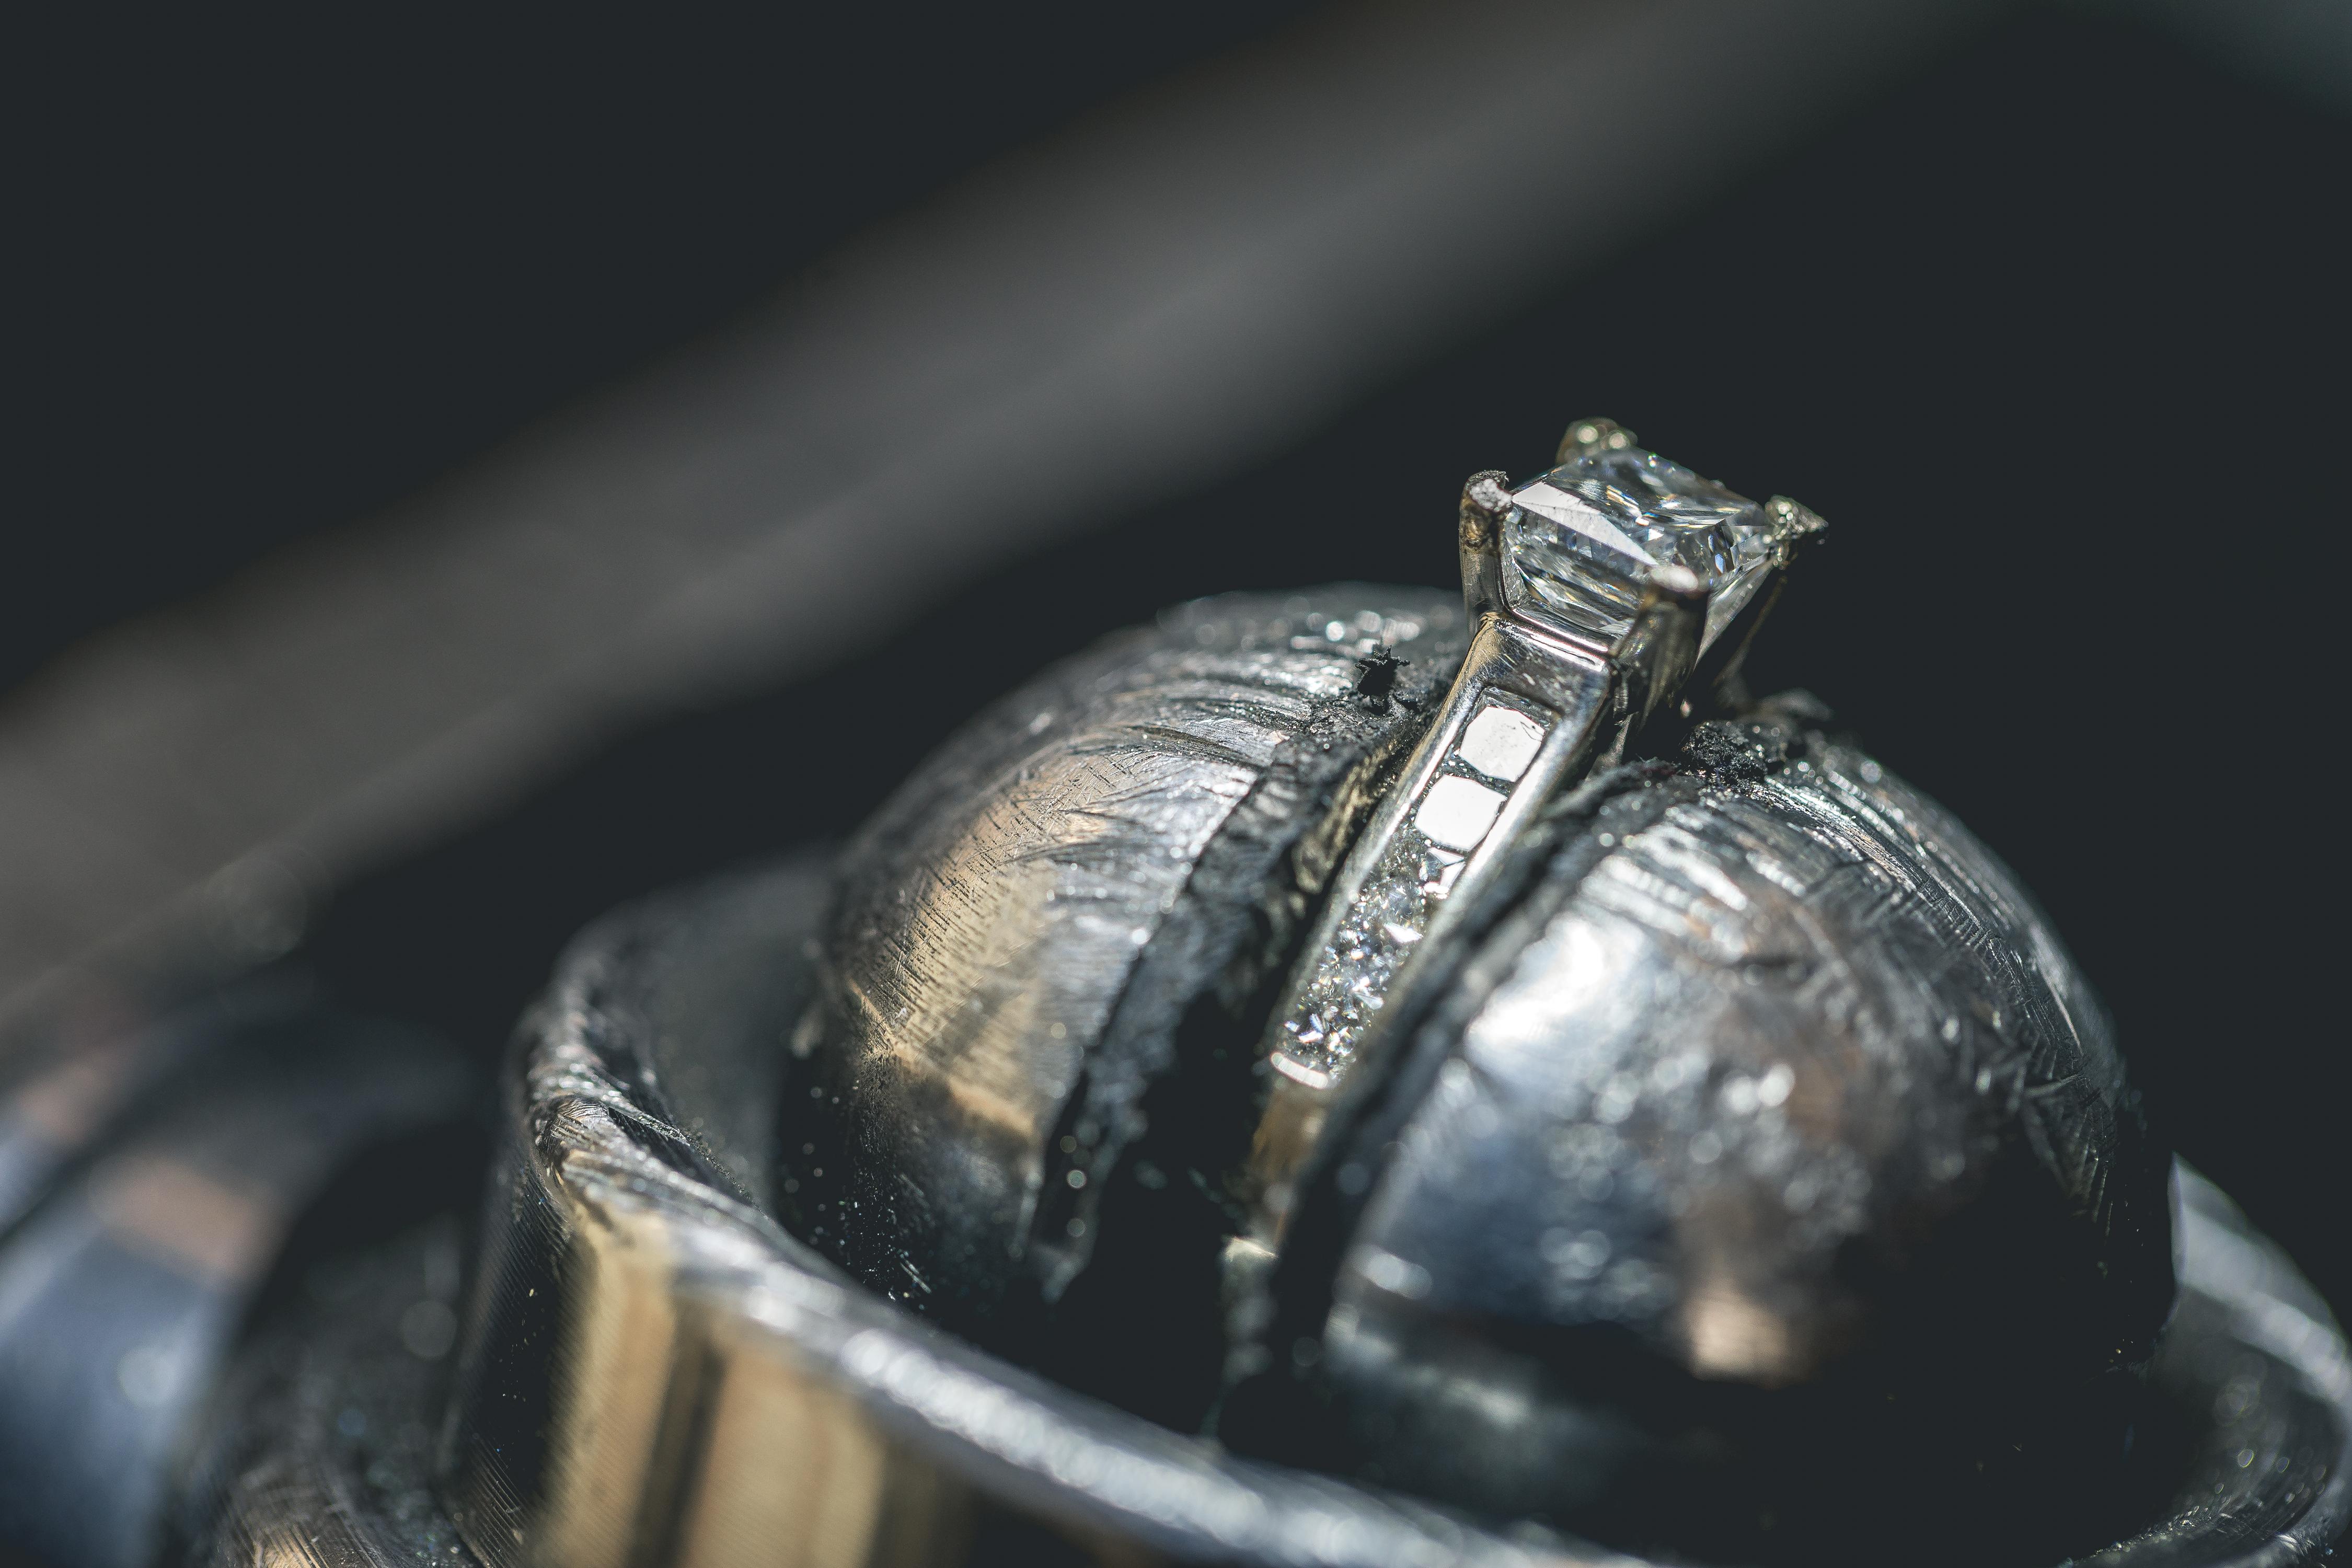 Precious diamond ring during repair and